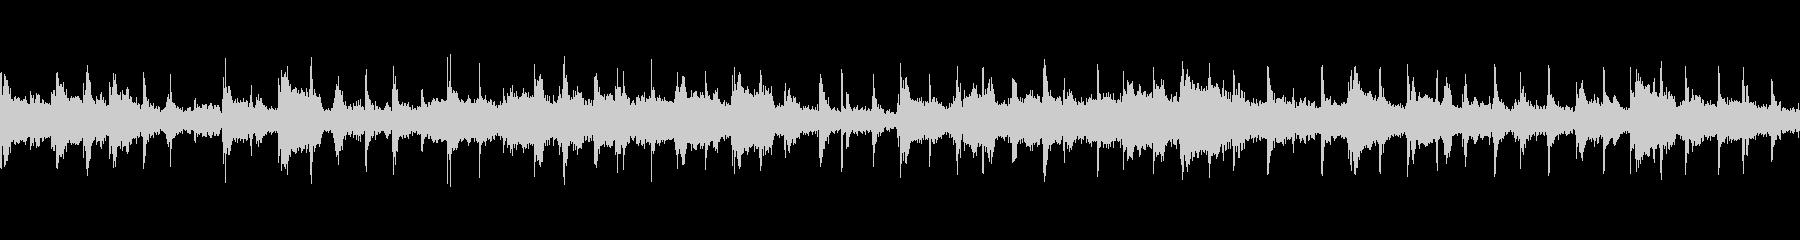 Indian style jingle sound logo box's unreproduced waveform